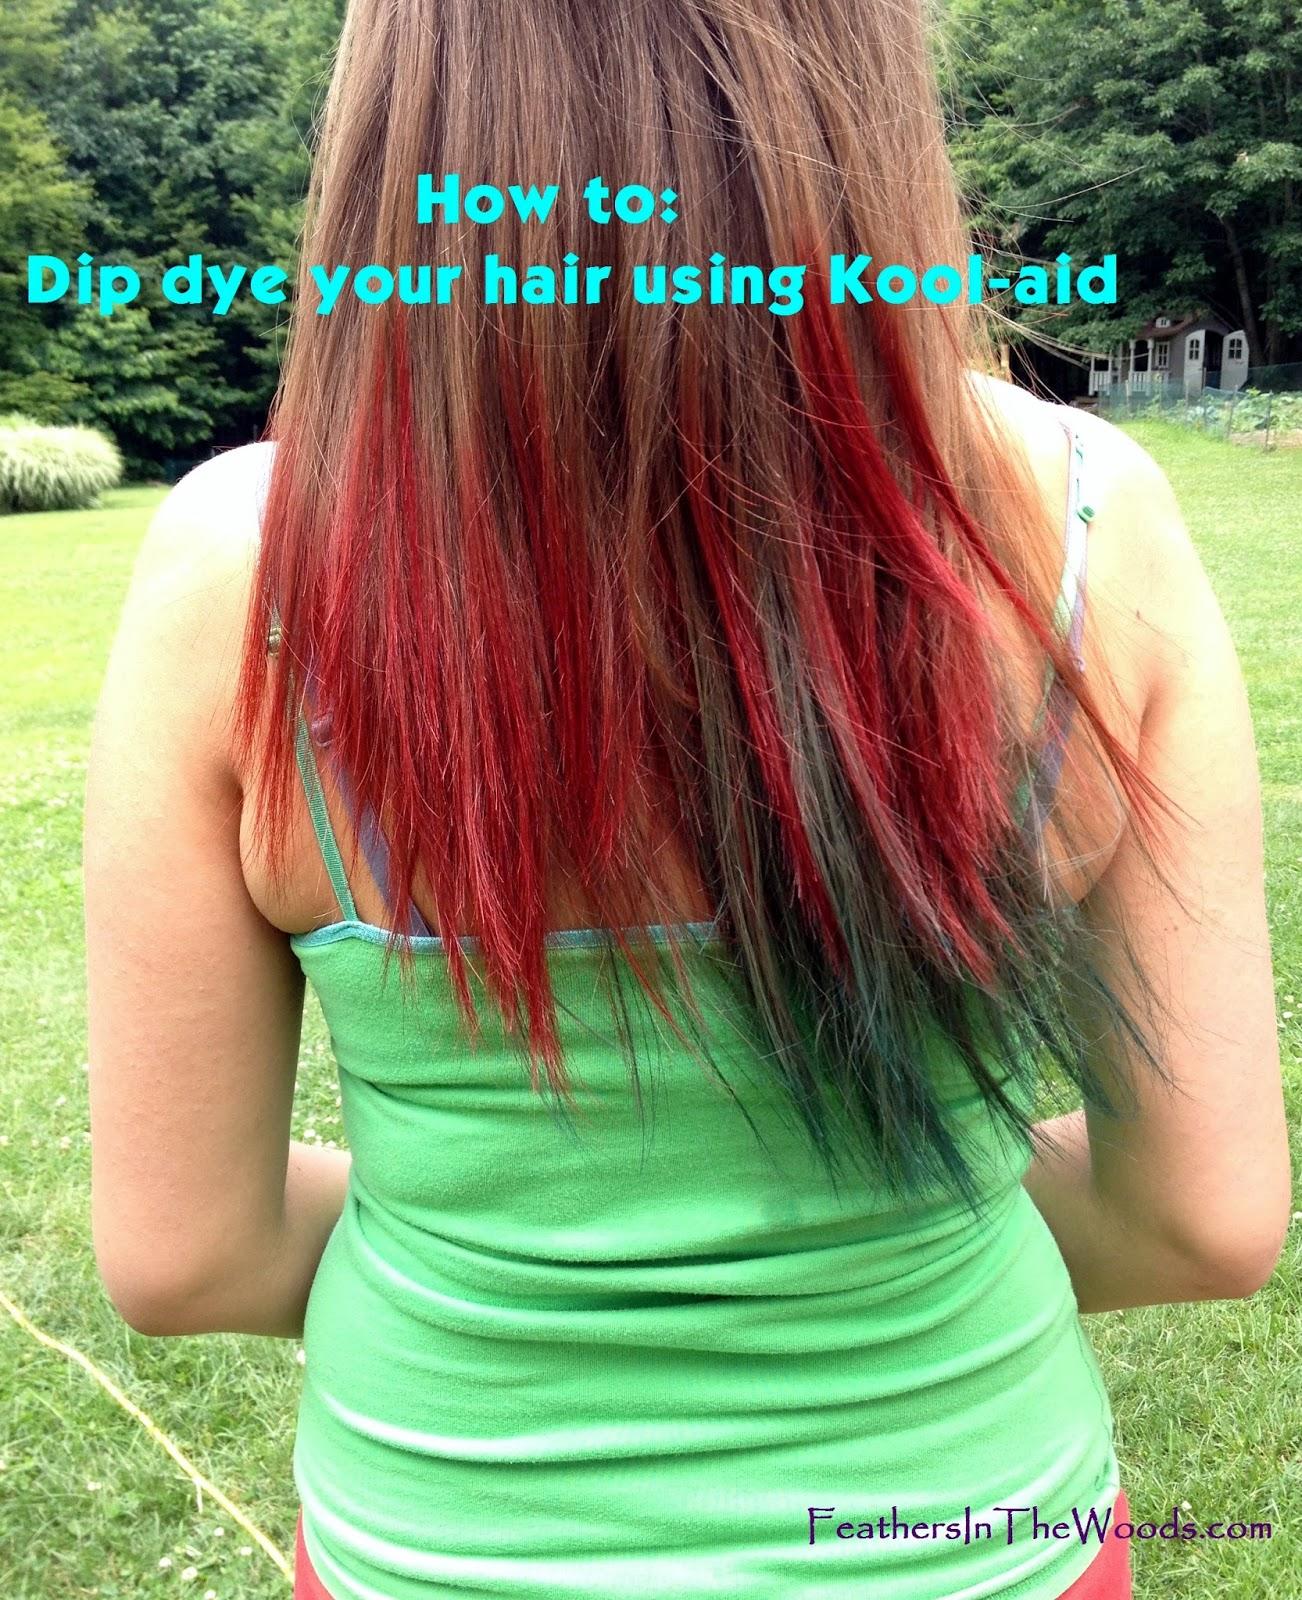 Hair Color Using Kool Aid 2017 2018 Best Cars Reviews